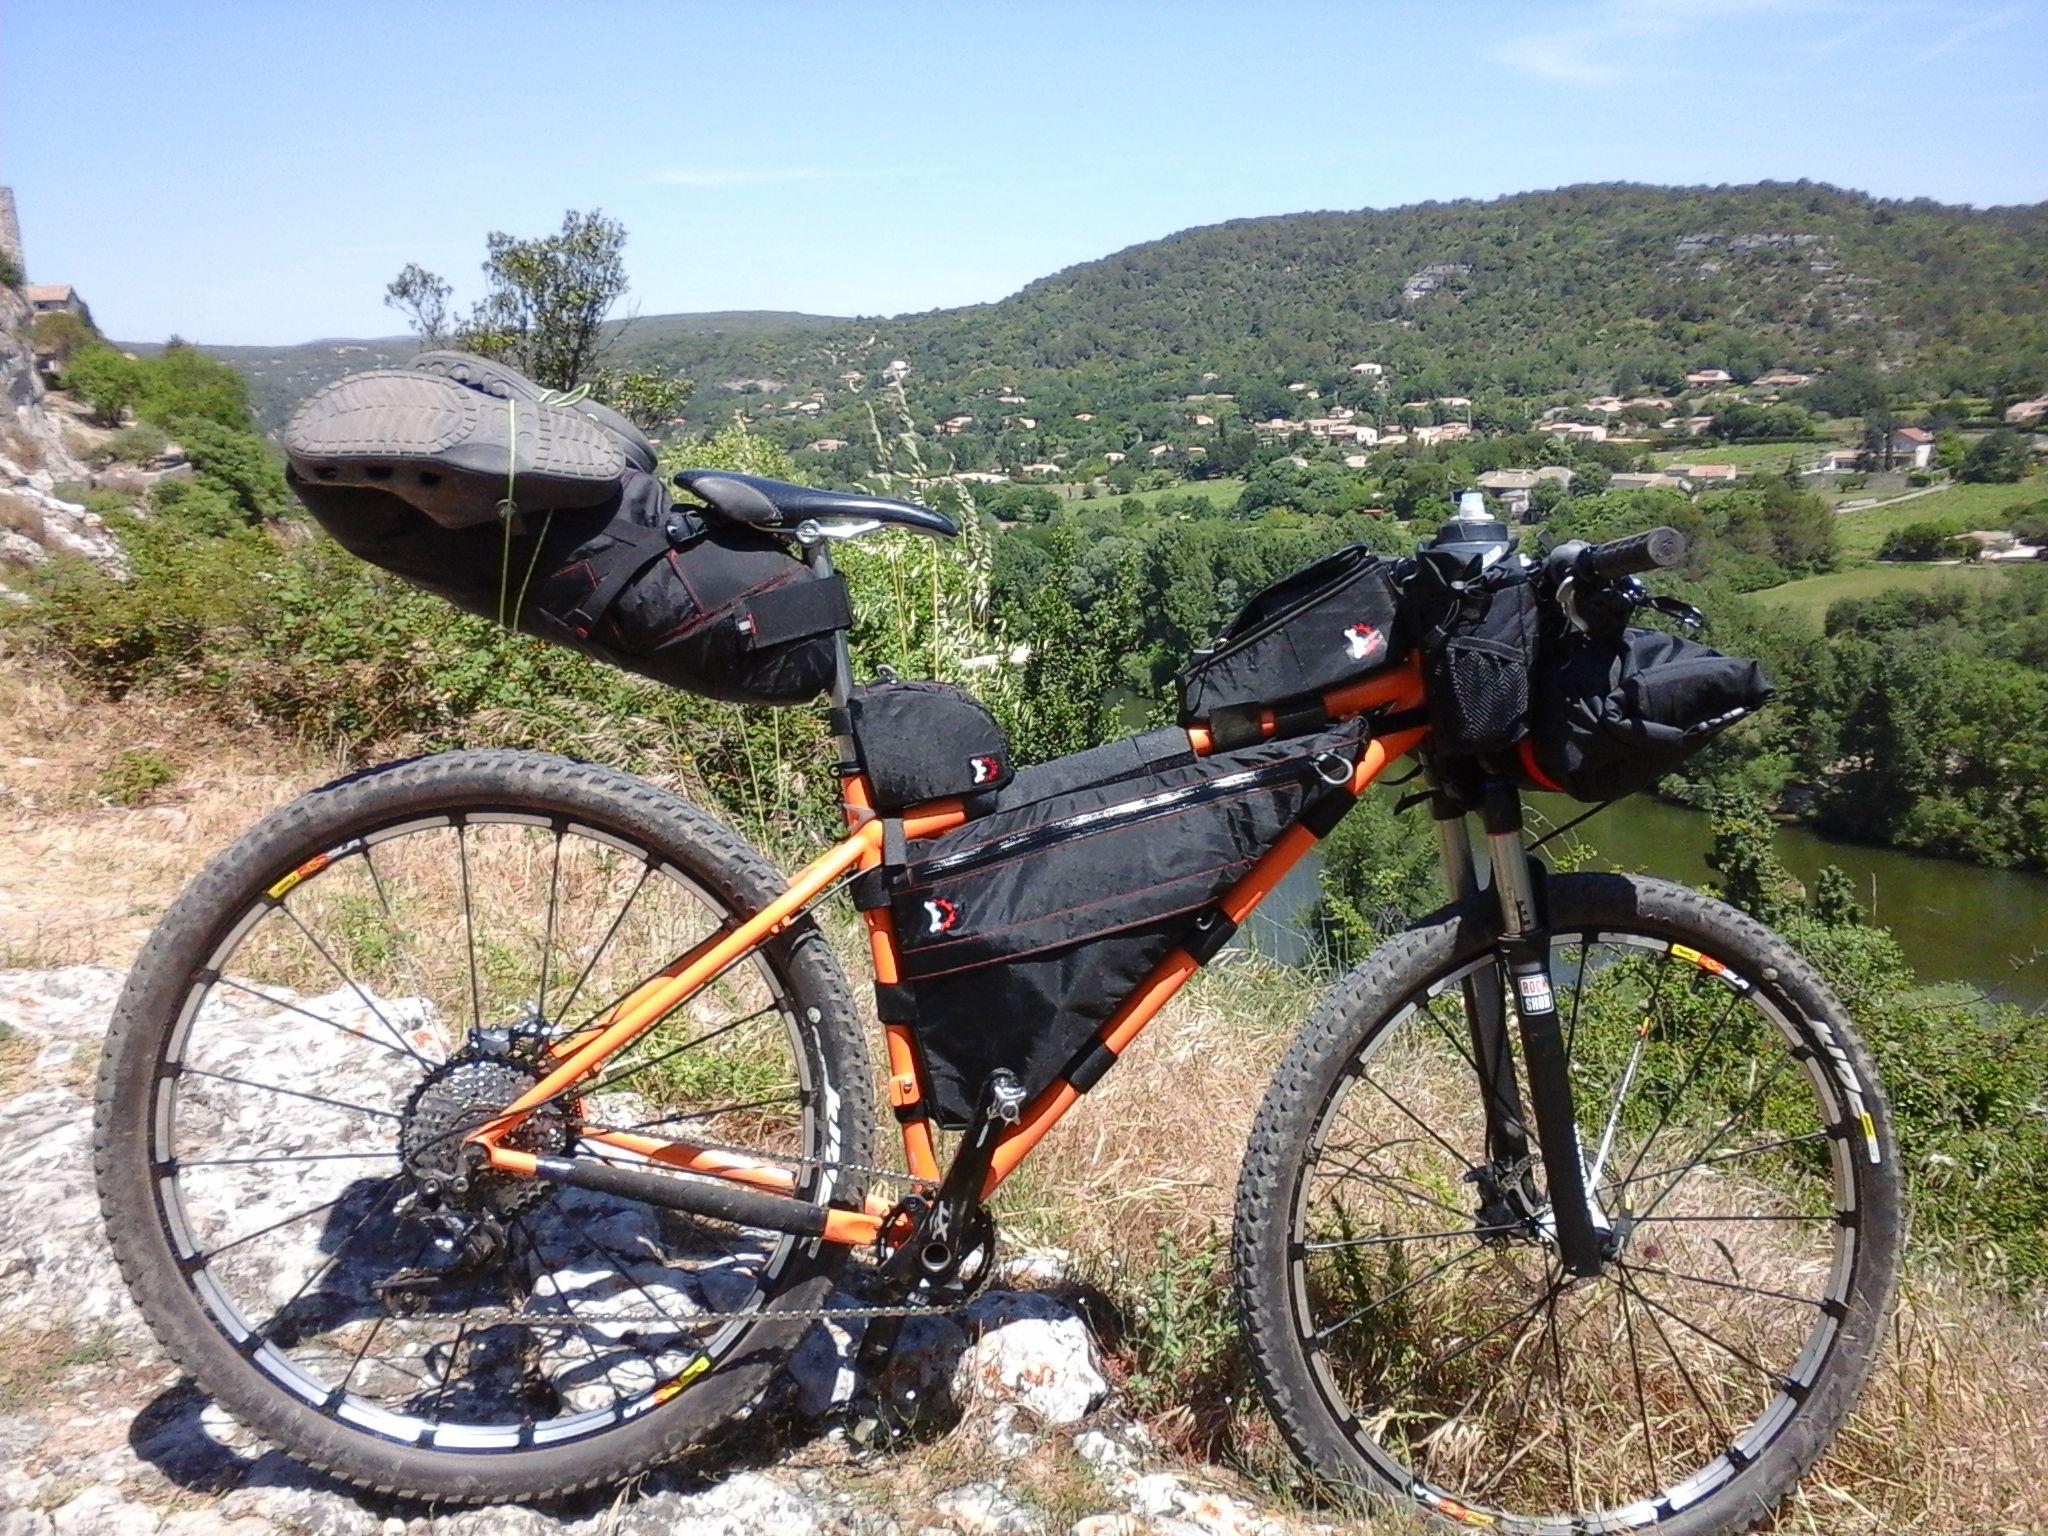 Cyclisme Outdoor Triangle Vélo avant Tube Cadre Sac Vélo De Montagne Vélo De Montagne Pochette